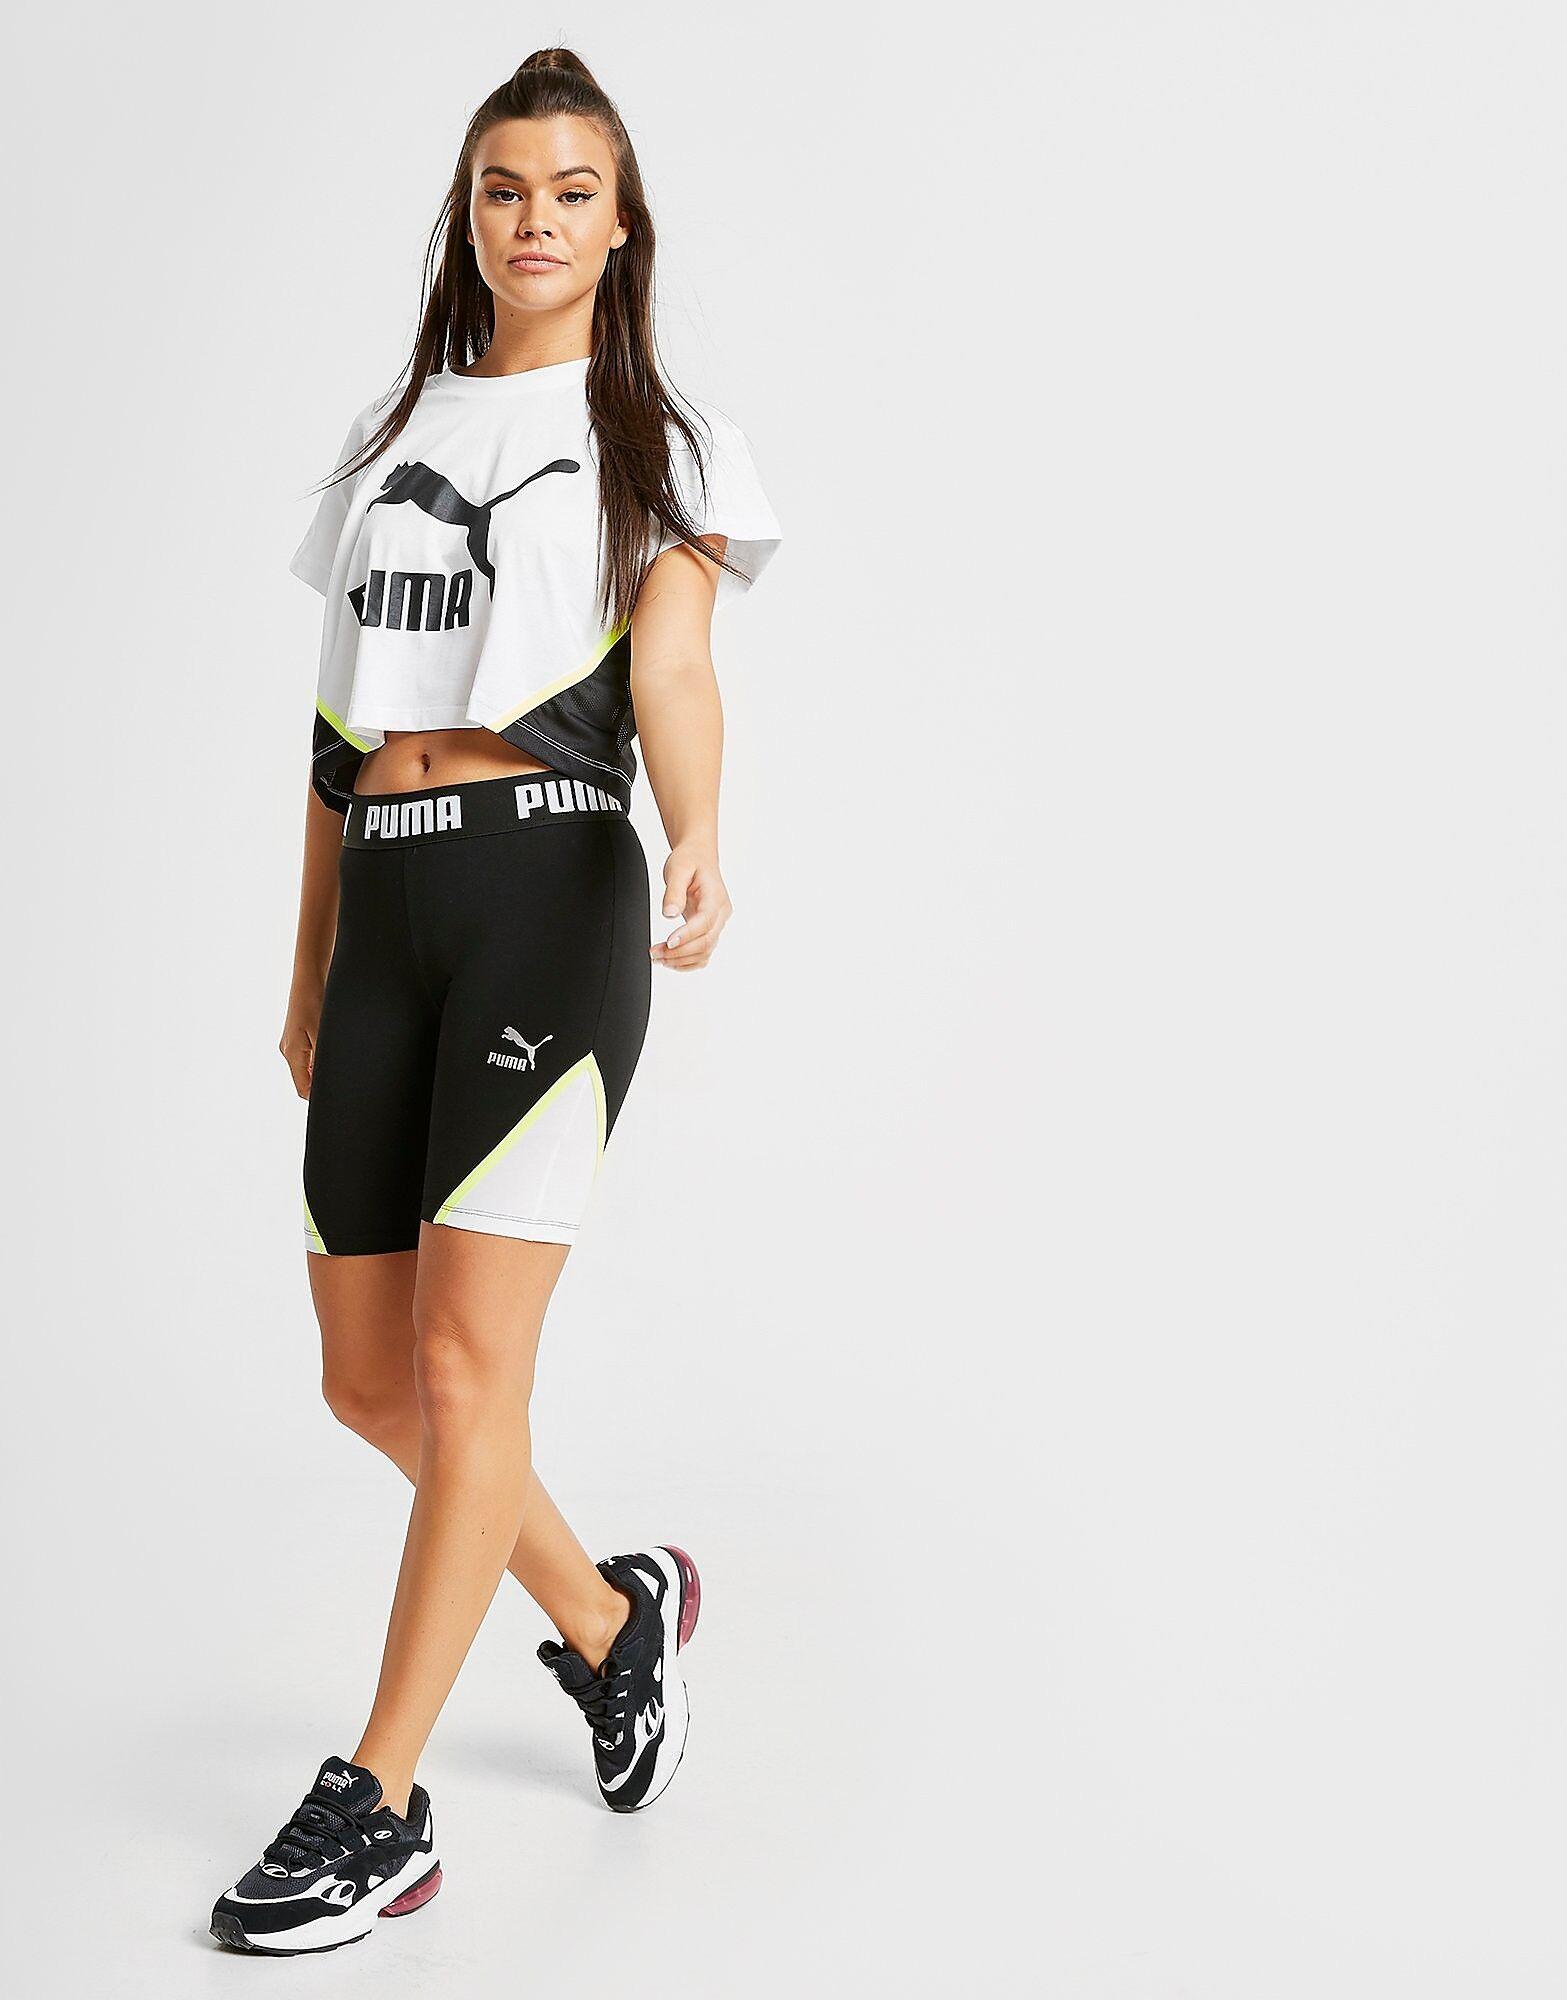 Image of Puma Colour Block Cycle Shorts - Only at JD - Womens, Musta